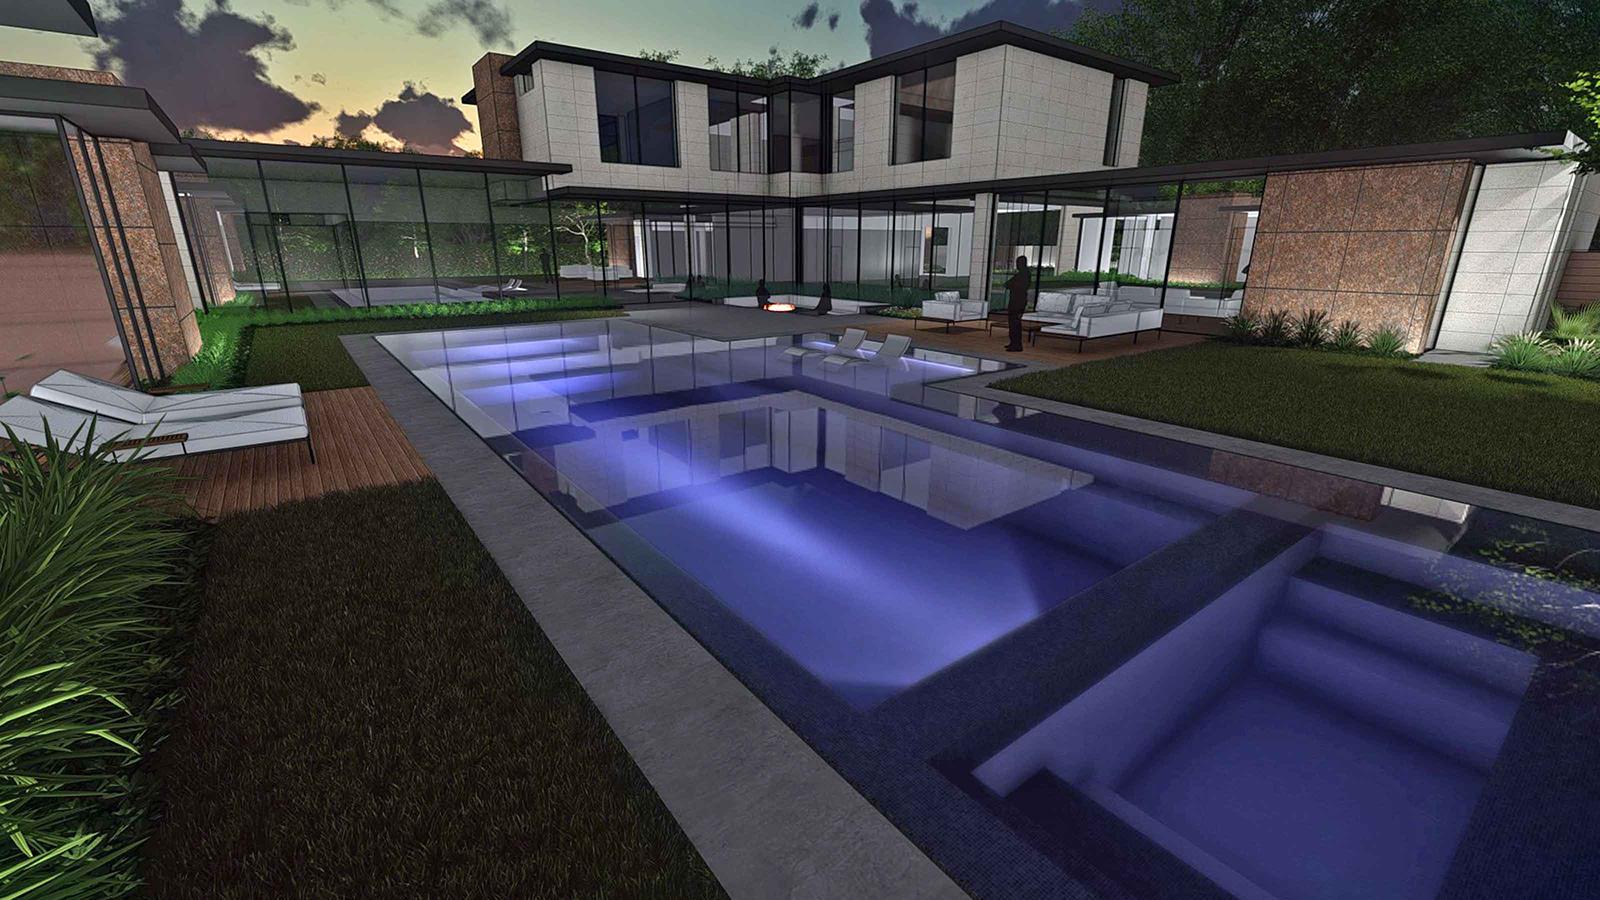 ddla-design_lindhurst-rear-pool-rendering.jpg